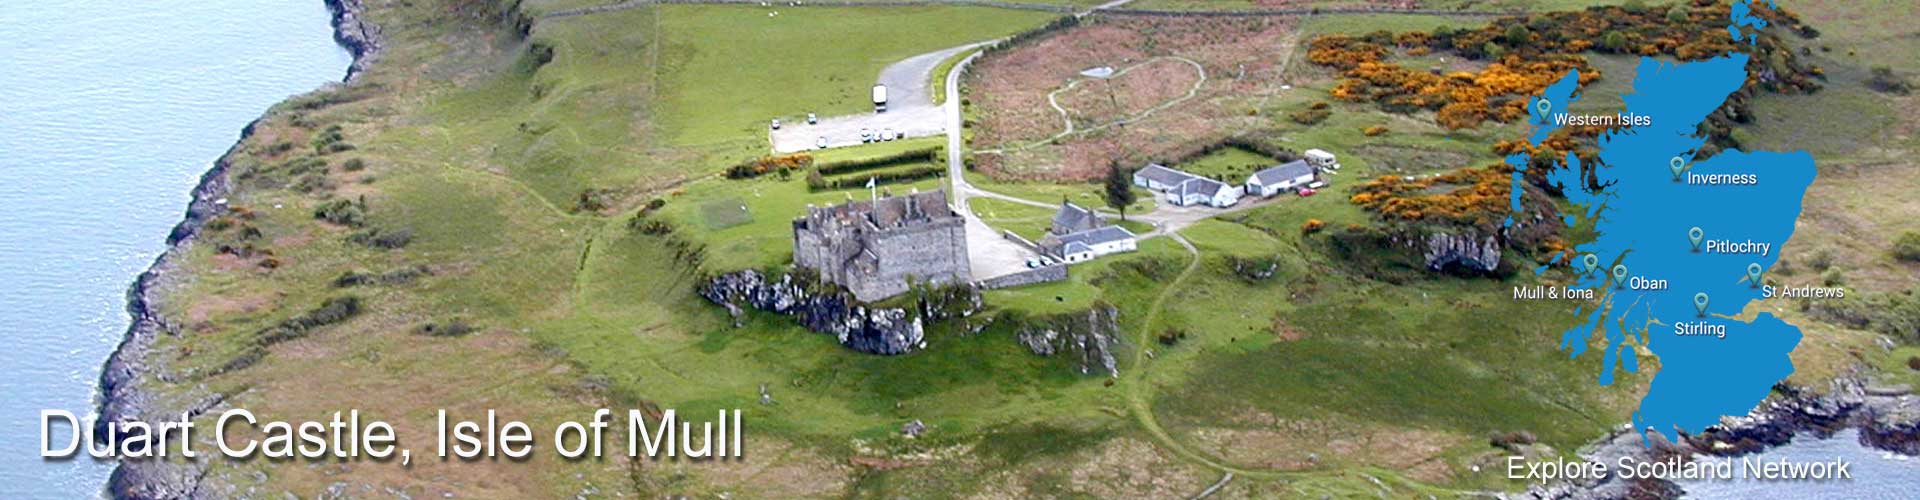 isle of mull duart castle